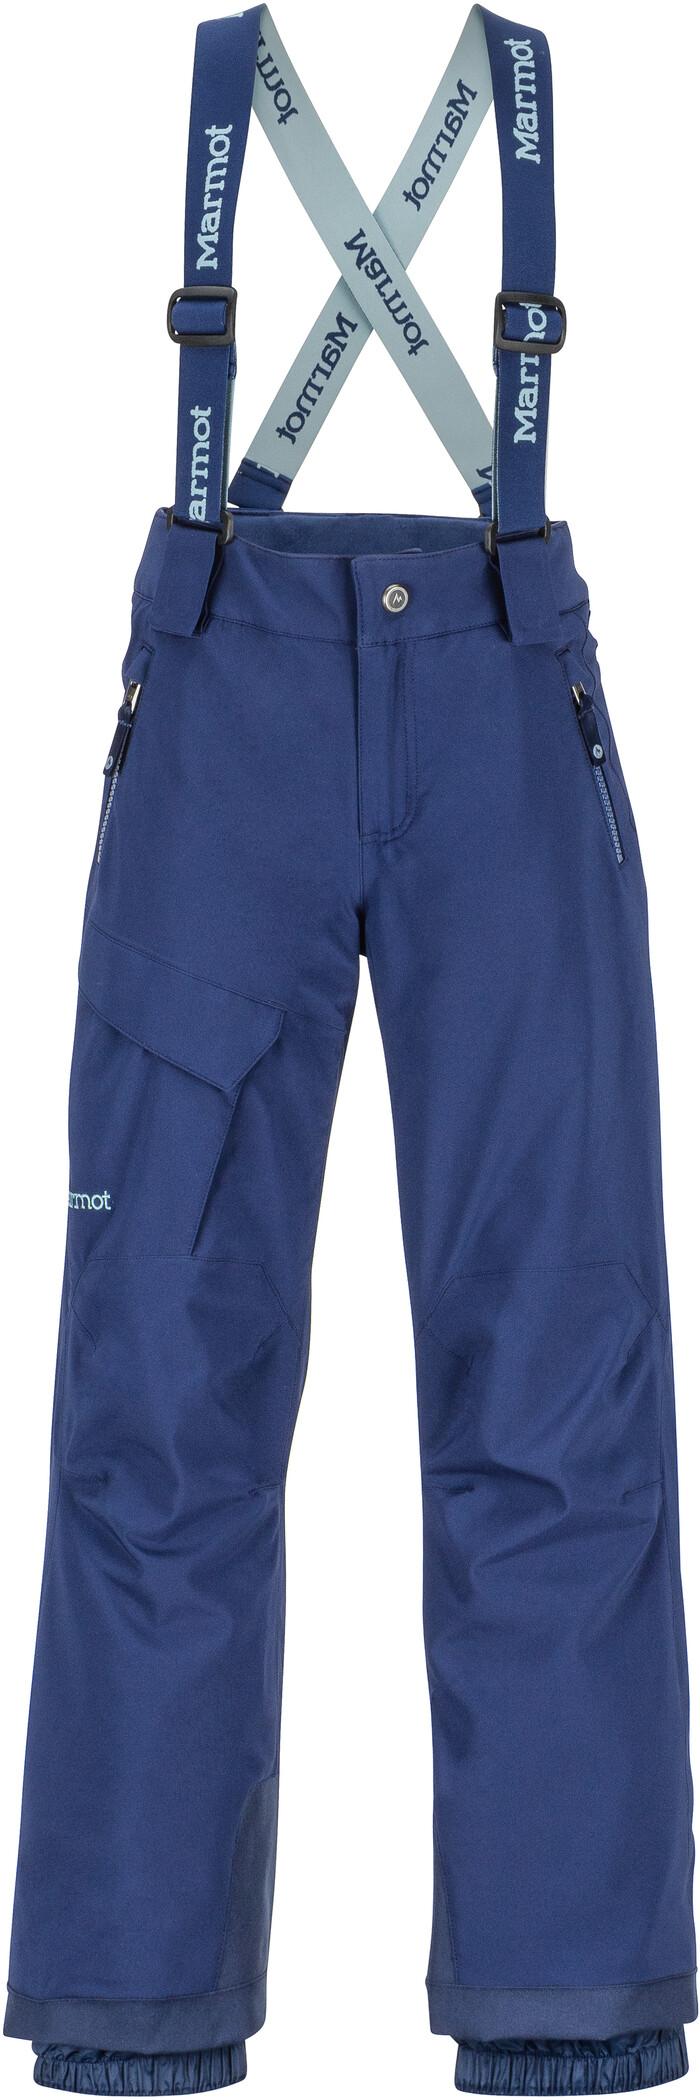 Bull Star hardshelljacke Rain Jacket Work Jacket Pigeon Blue//Navy Size L Mens